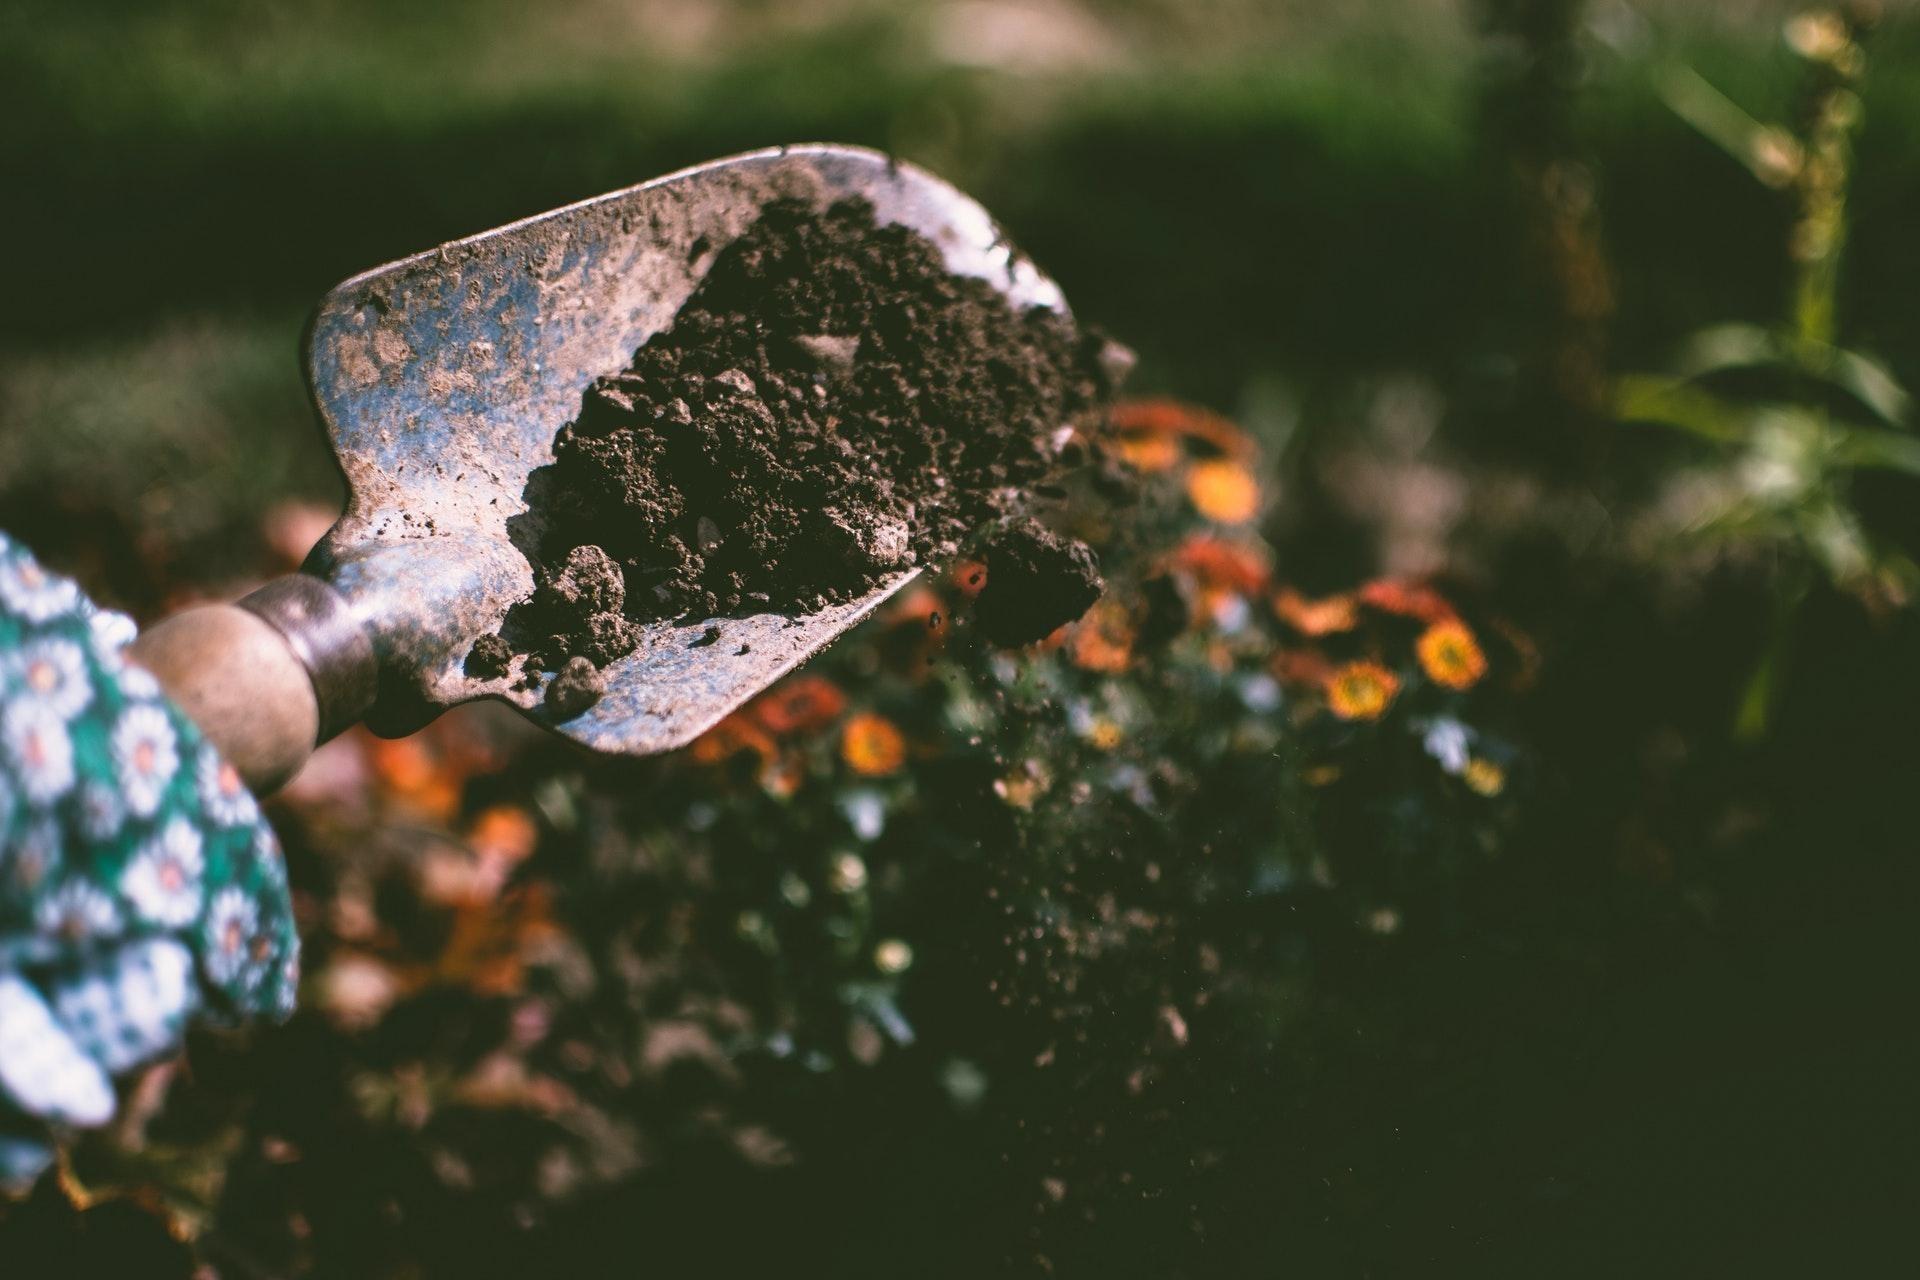 Pimp your garden